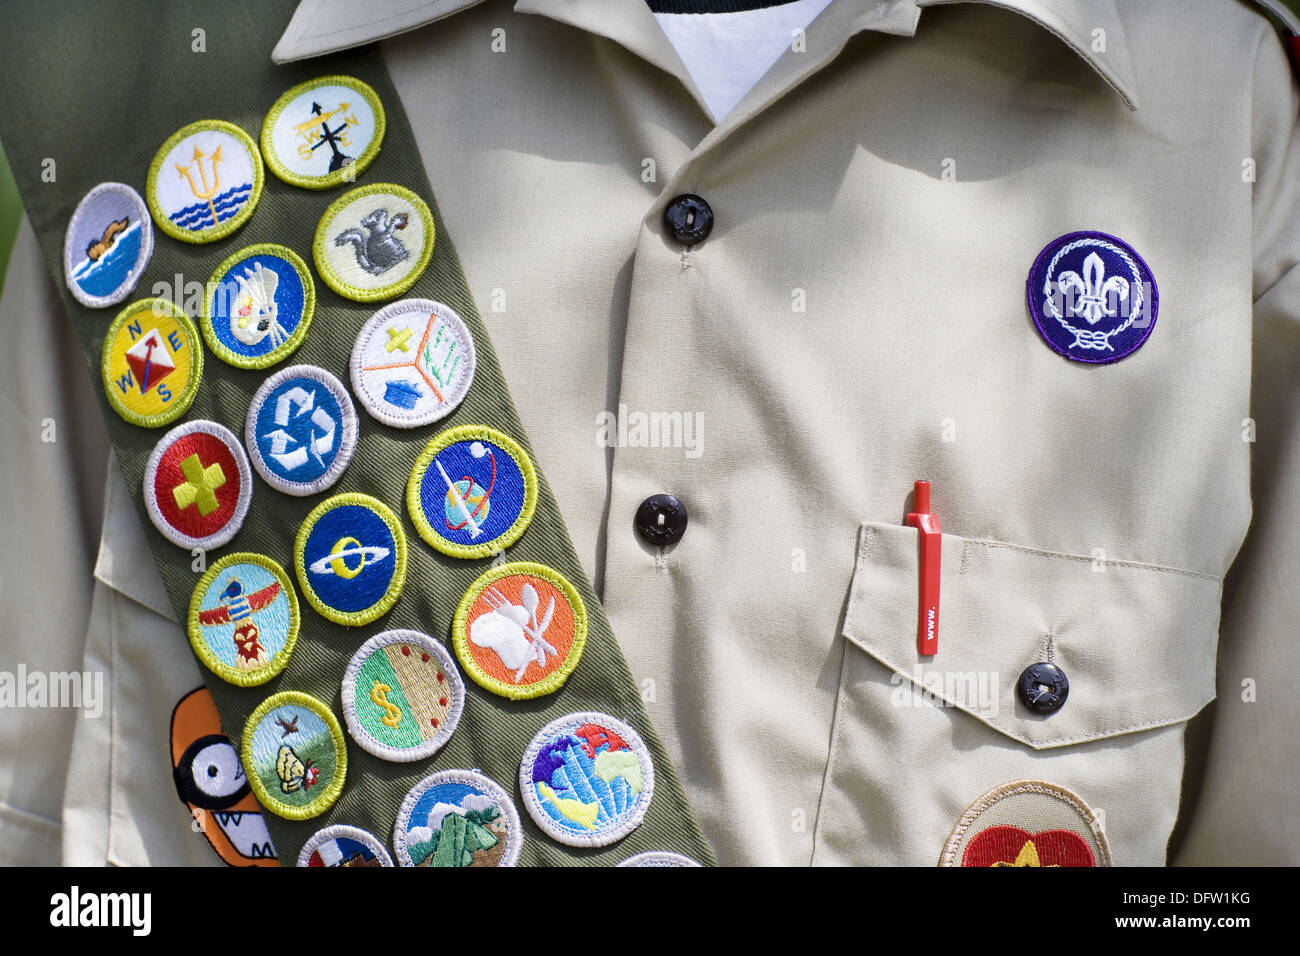 Boy Scout uniform, merit badges, Richmond, Virginia, USA - Stock Image